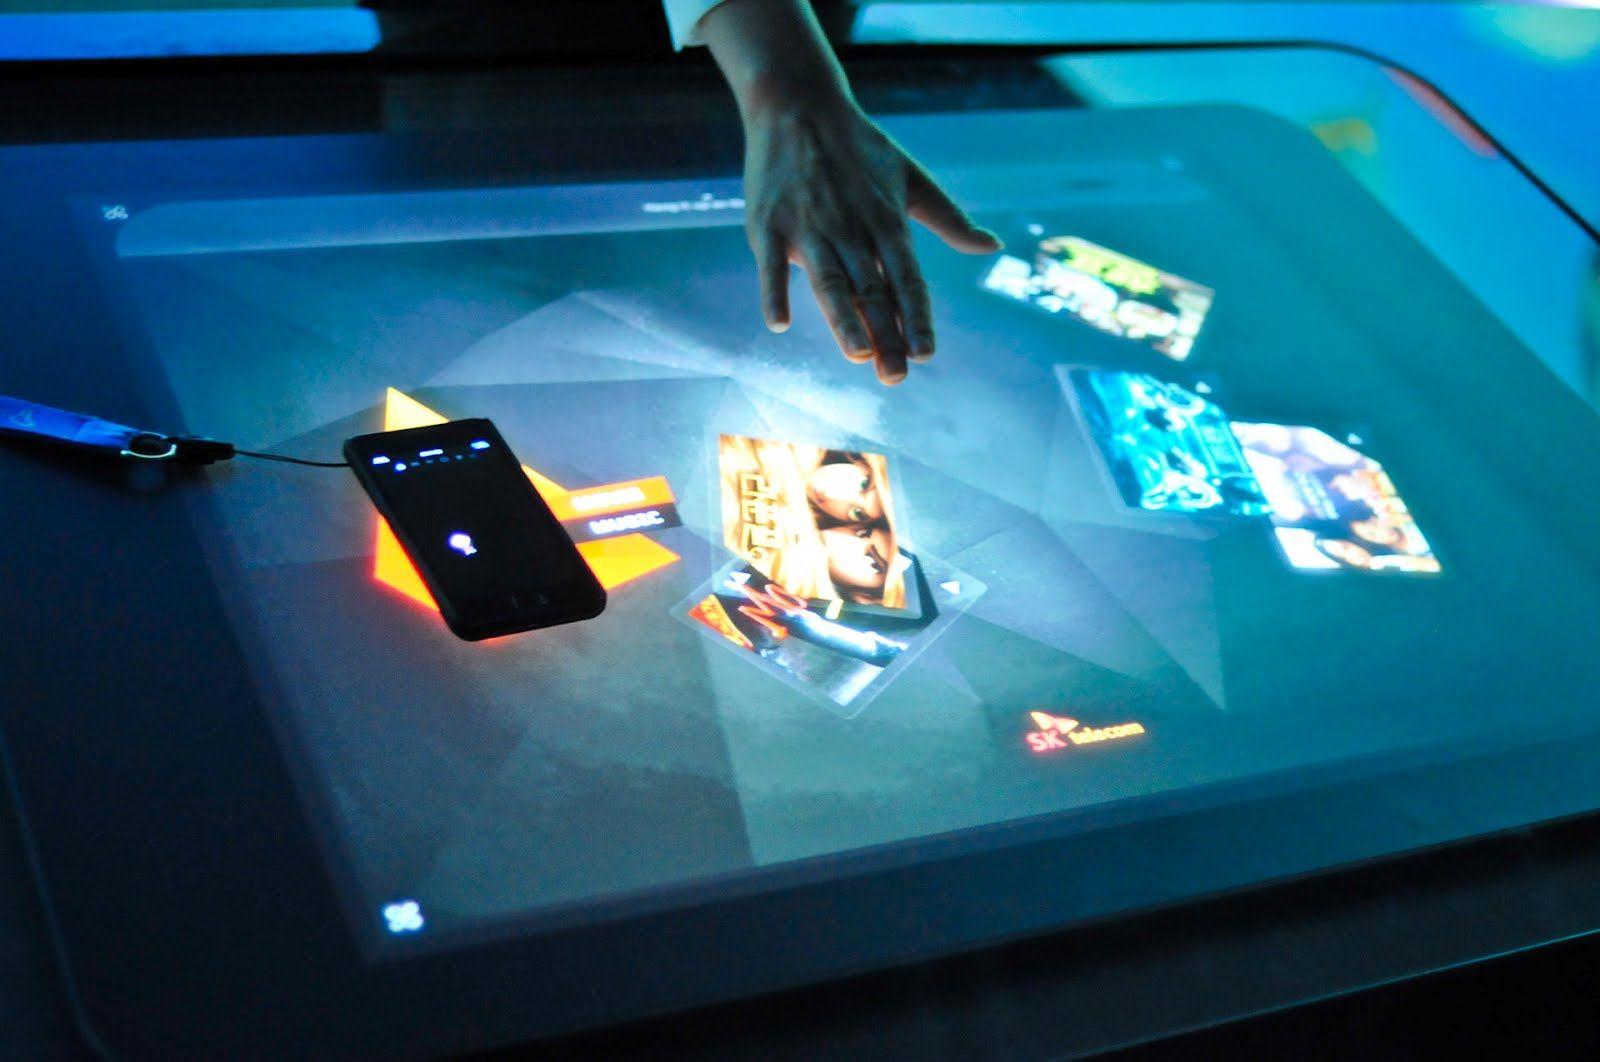 Inmotion Scv R2 Personal Electric Transporter Innovation Technology Future Technology Tech Art